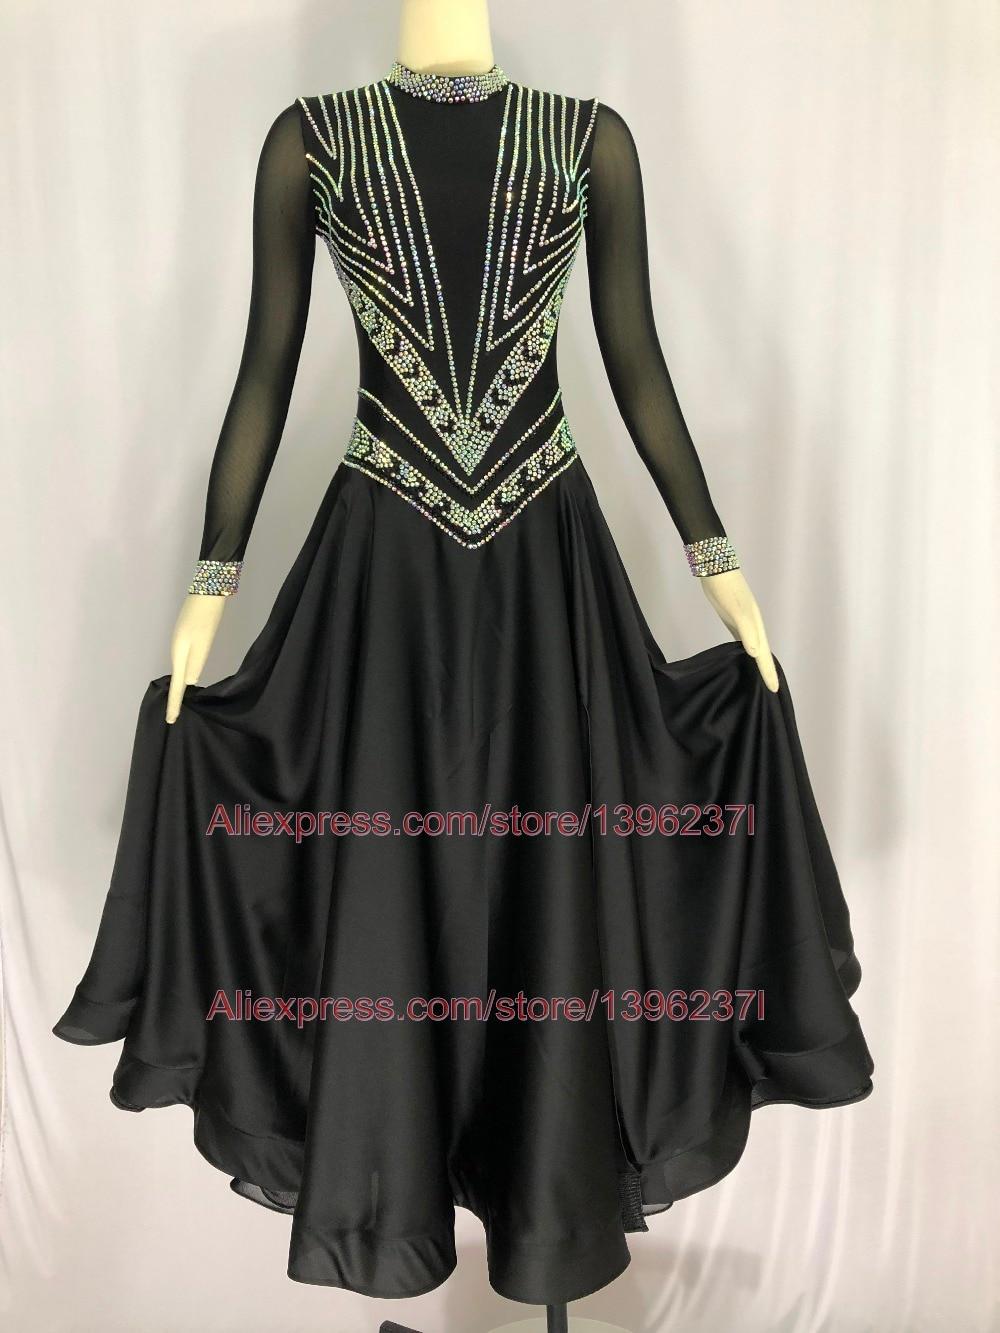 Black Ballroom Competition Dance Skirt Women Sexy Back Tango Dancing Costume Adult Custom Made Standard Ballroom Dress